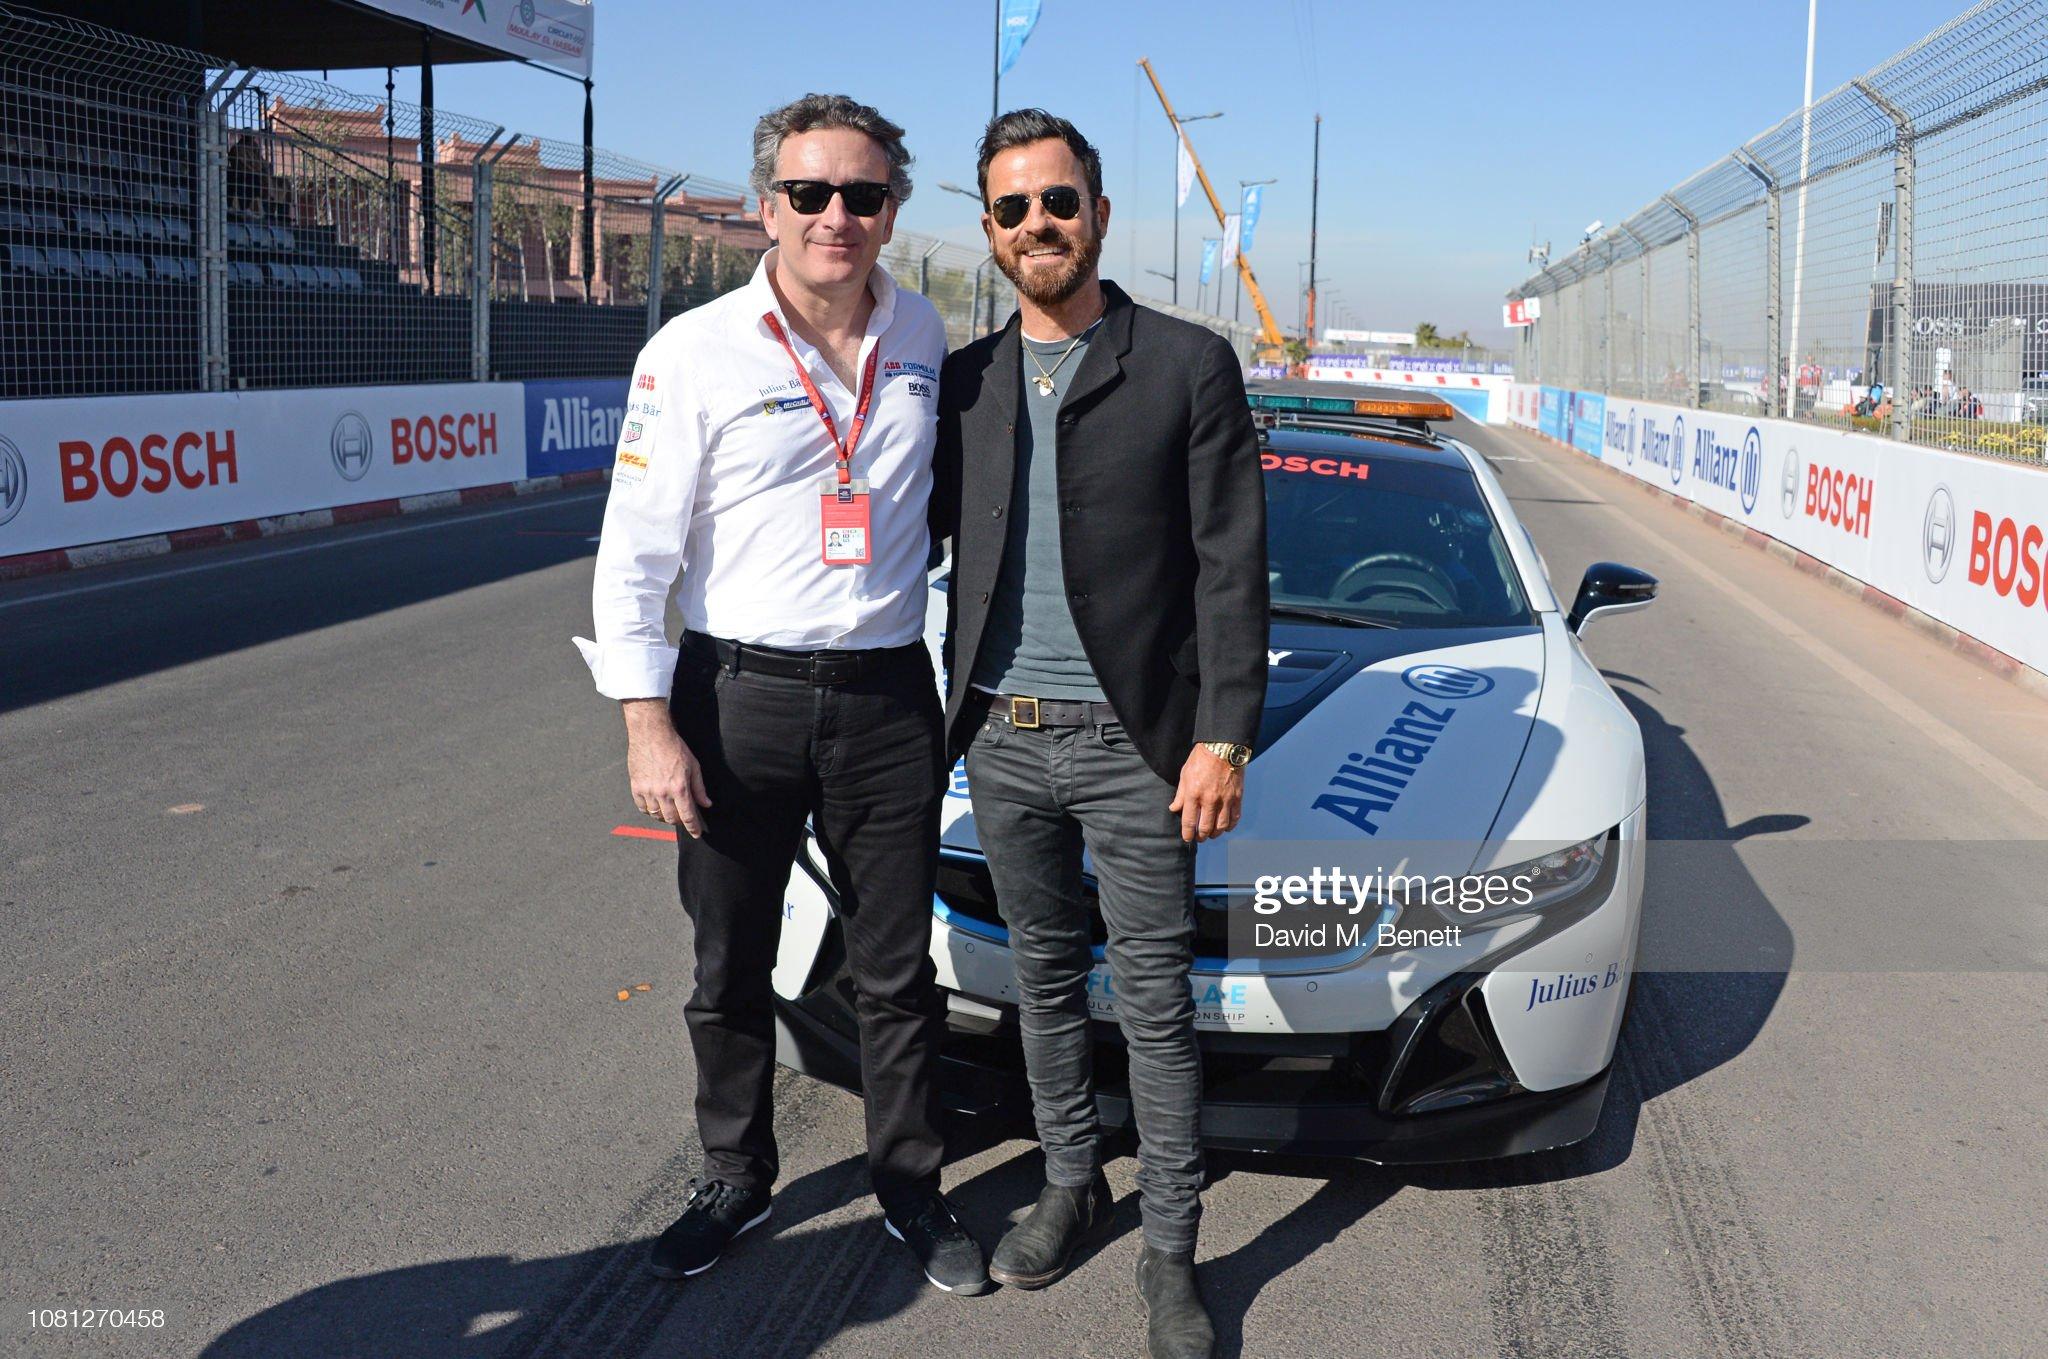 ¿Cuánto mide Alejandro Agag? - Altura - Real height Formula-e-ceo-alejandro-agag-and-justin-theroux-attend-the-abb-fia-e-picture-id1081270458?s=2048x2048